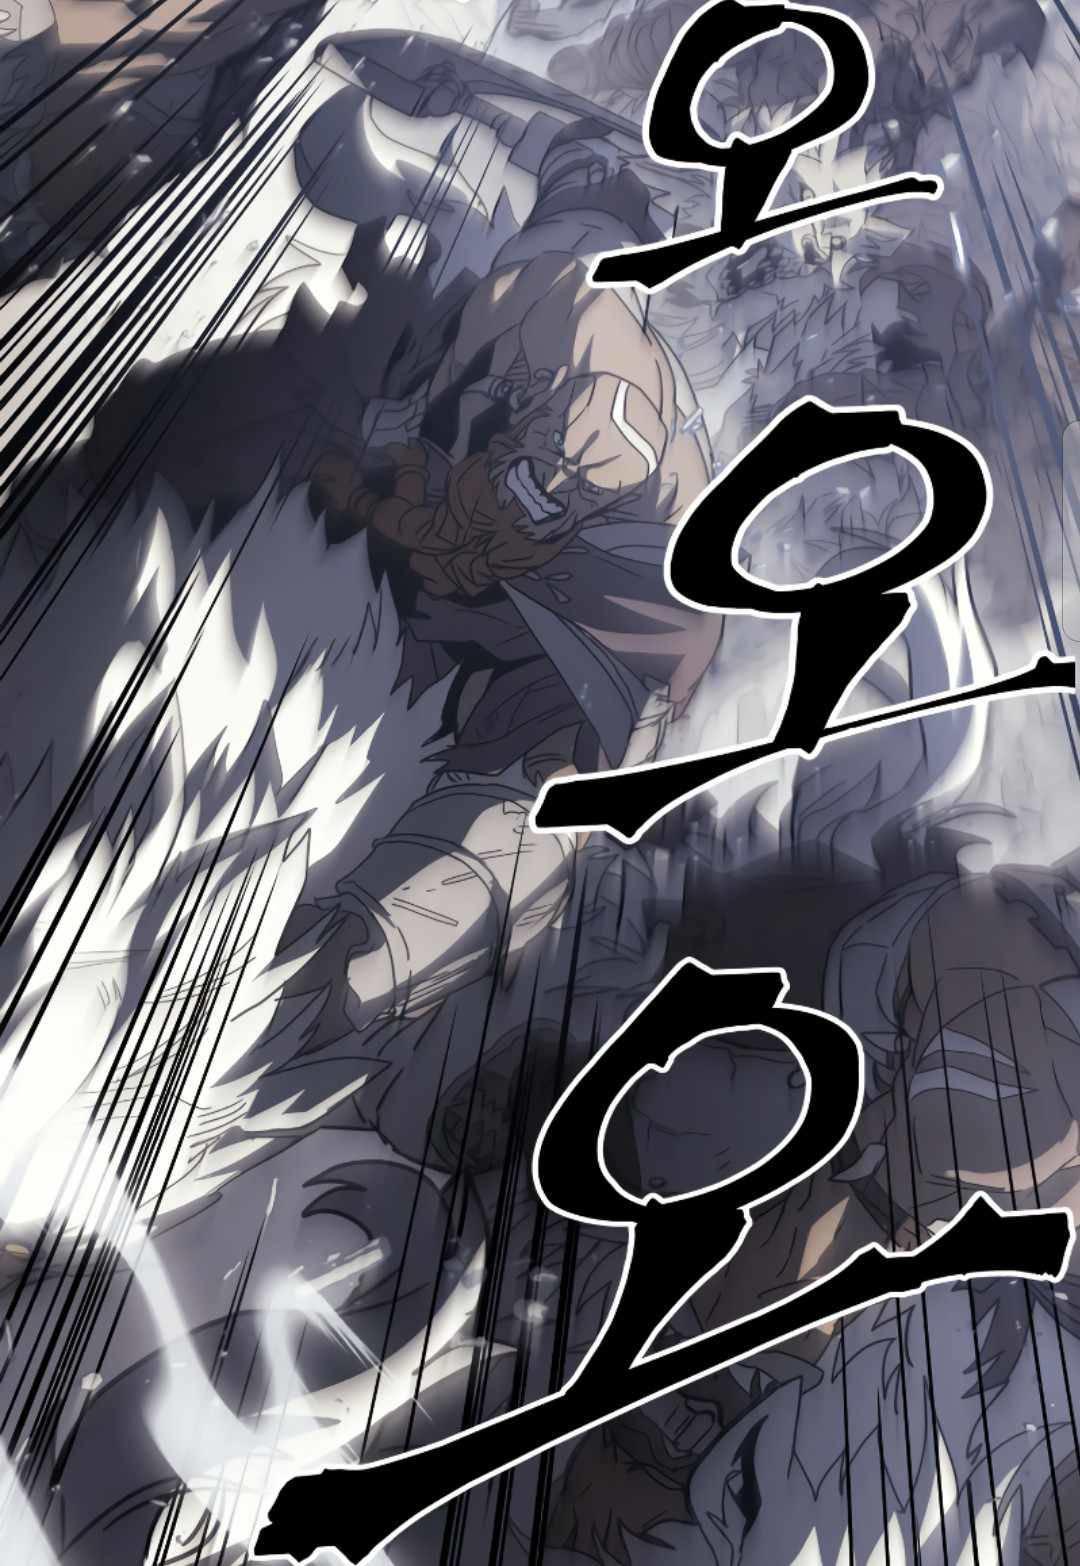 A Returner's Magic Should Be Special Chapter 163 page 10 - Mangakakalot